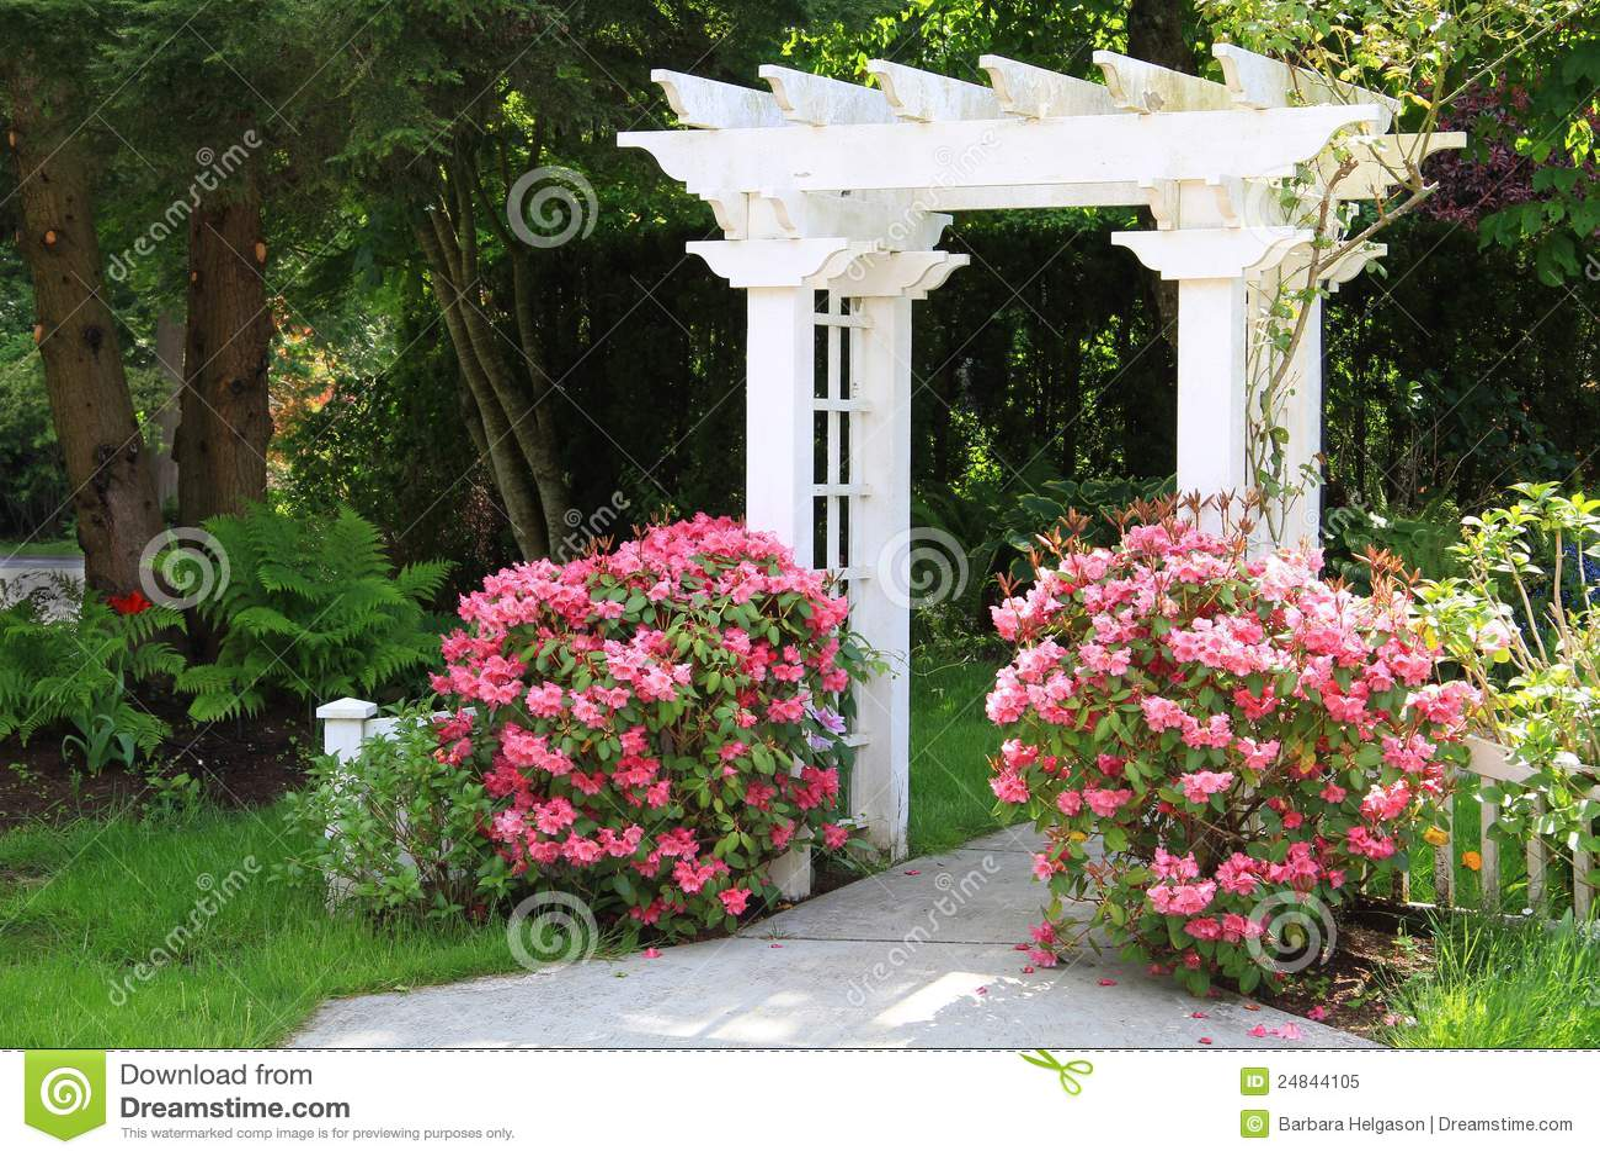 Garden Arbor Stock Image - Image: 9674901